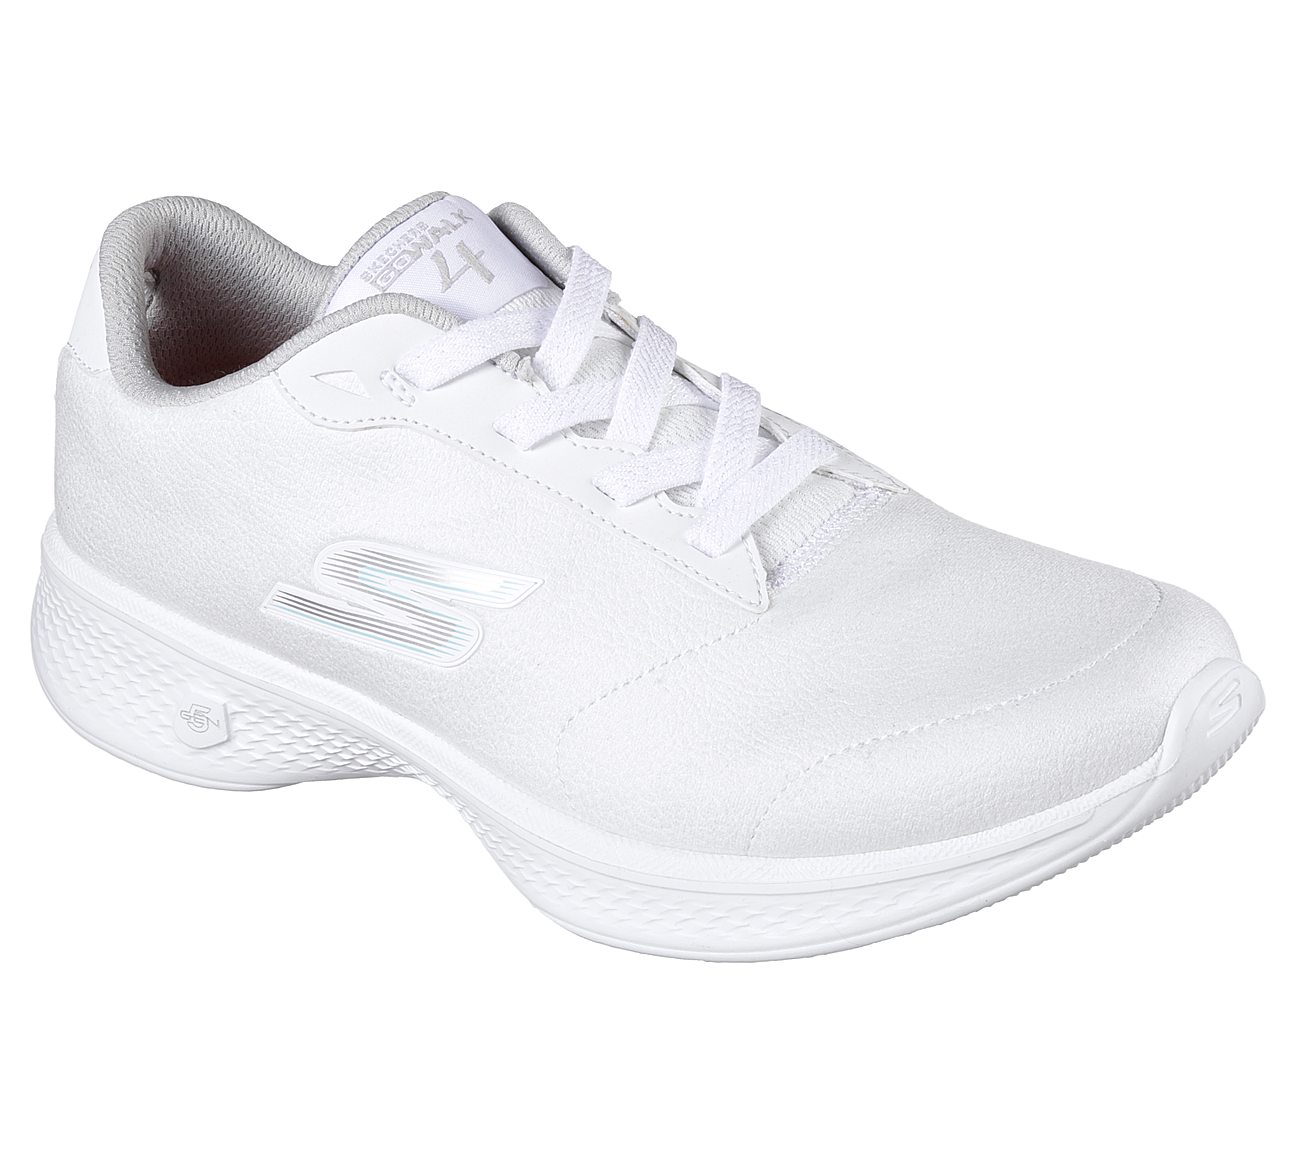 Buy SKECHERS Skechers GOwalk 4 - Premier Skechers Performance Shoes ... 5ab6079757721